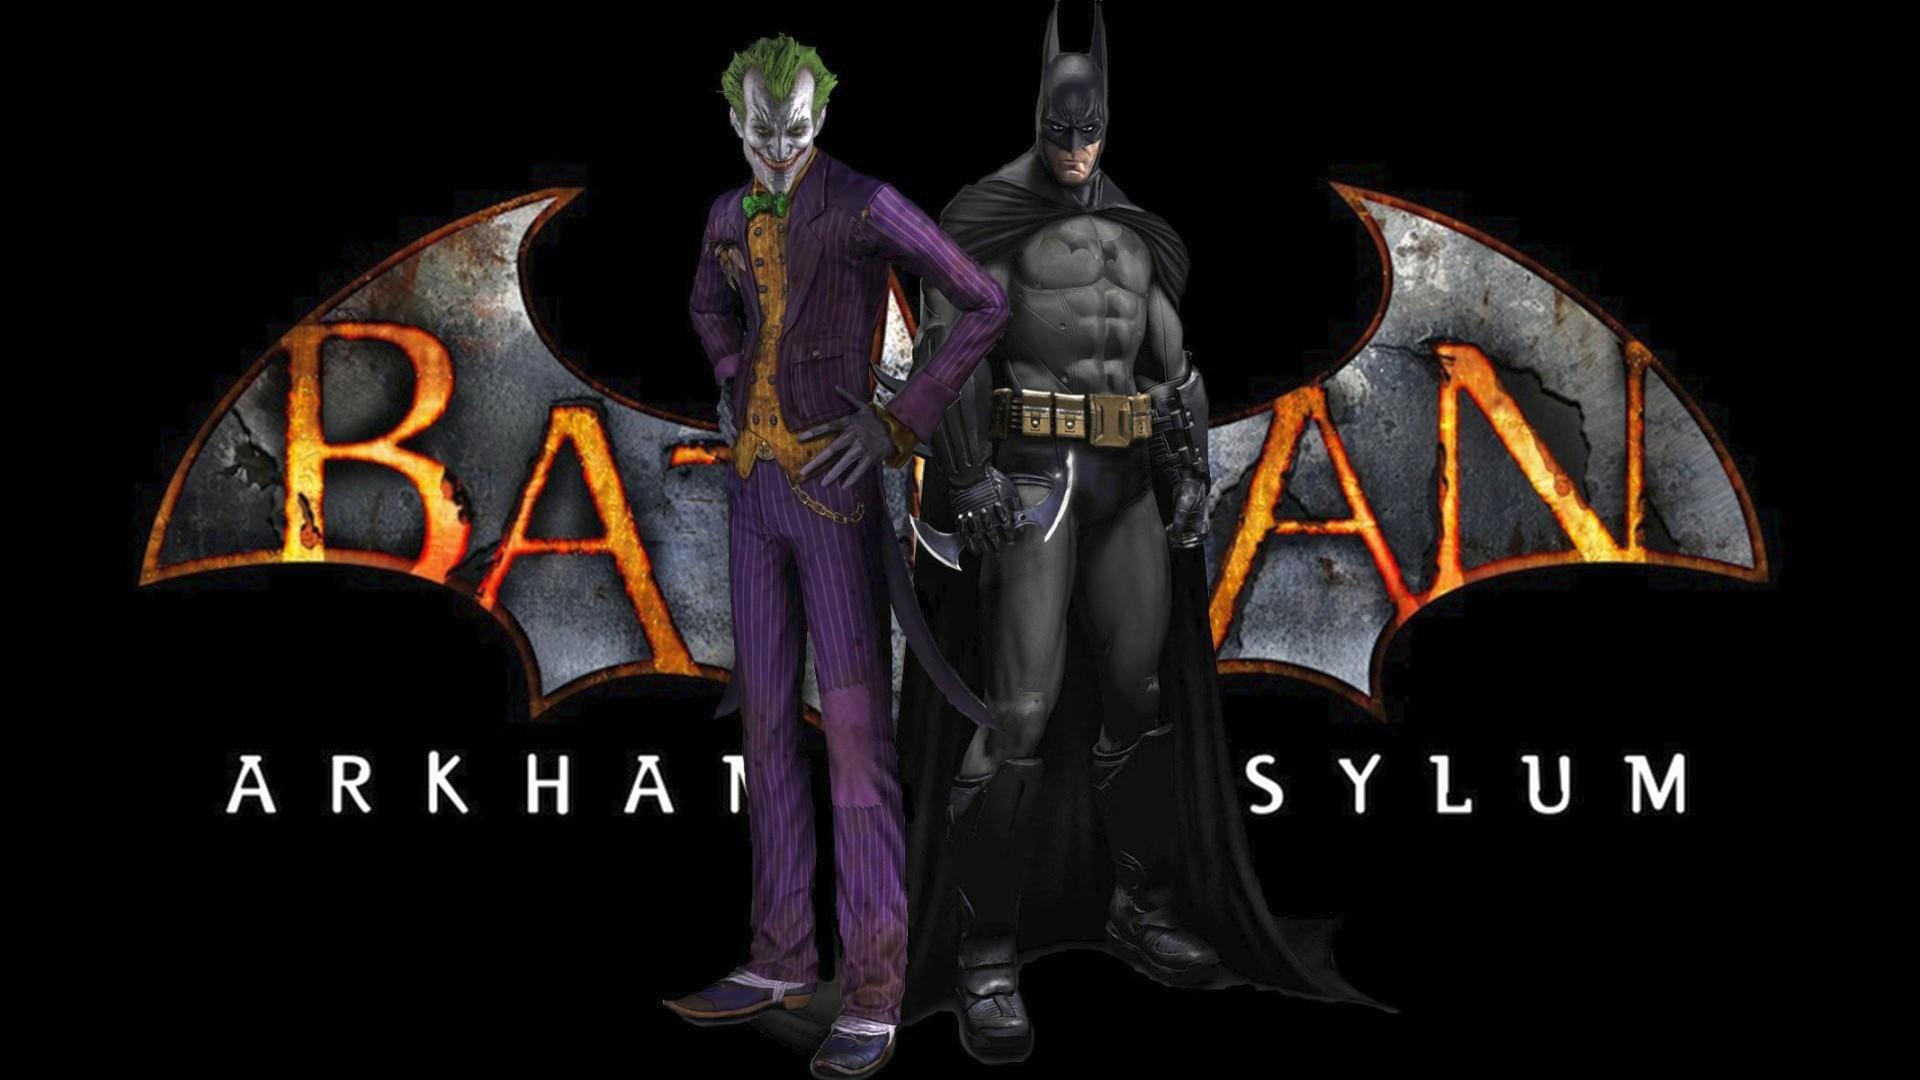 Batman Arkham Asylum Details Launchbox Games Database